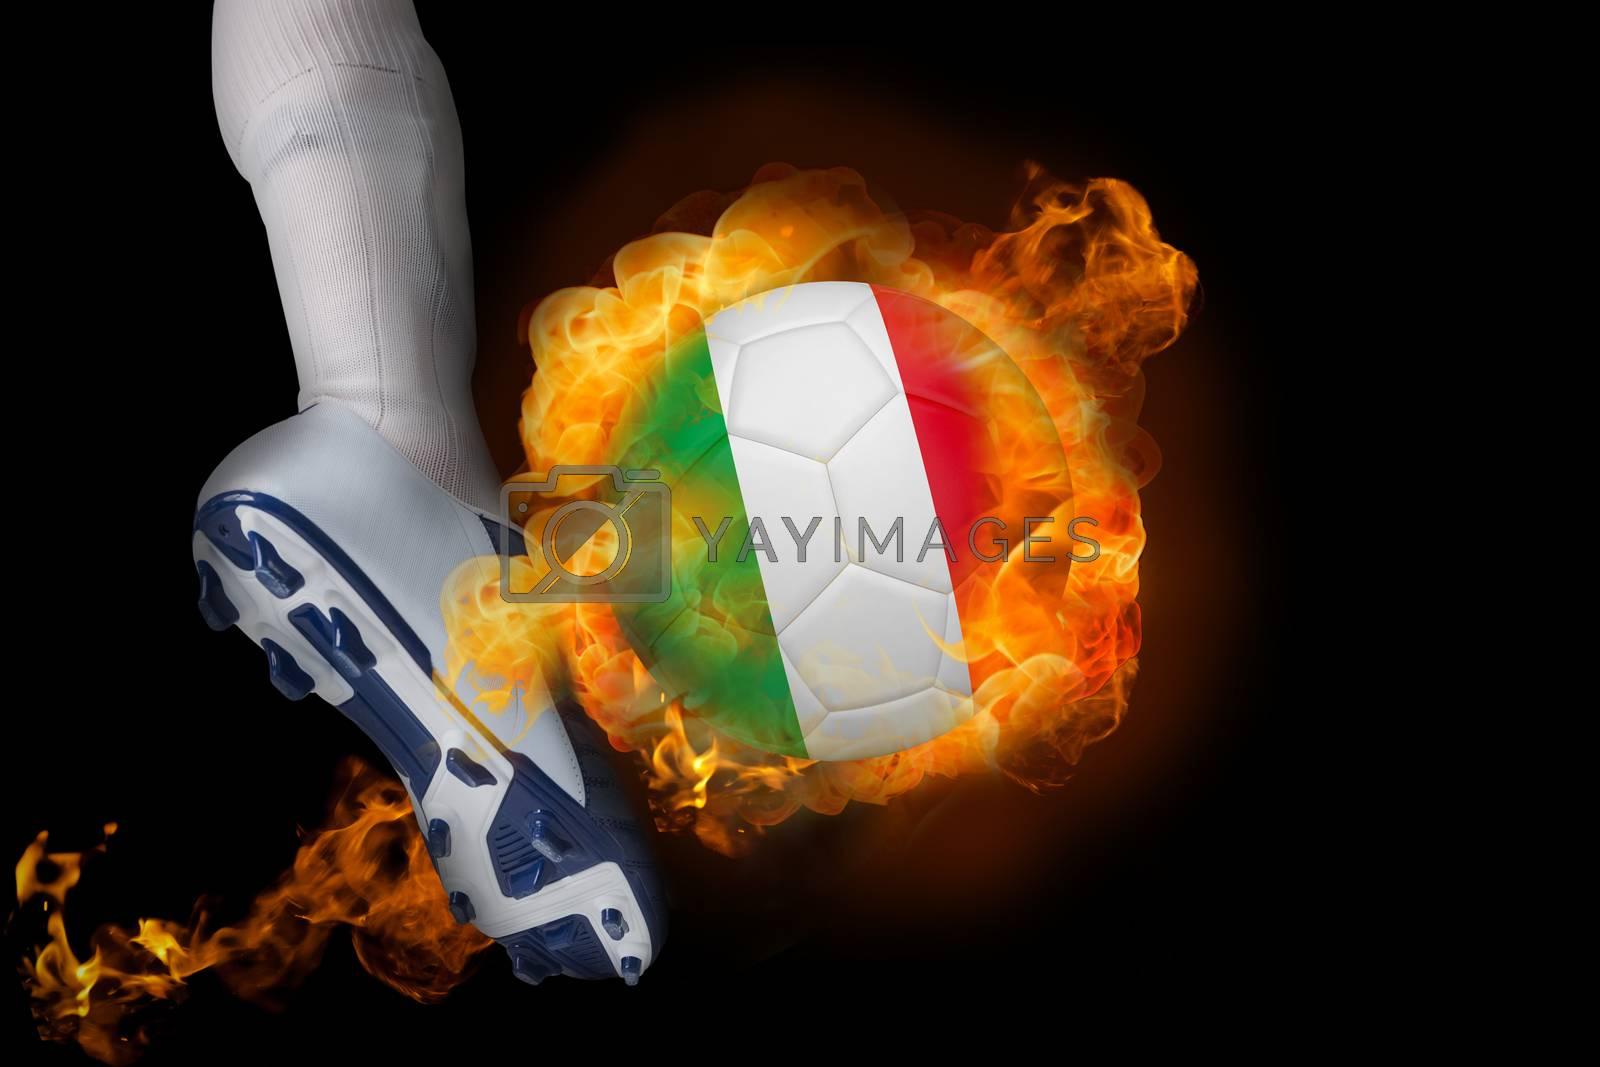 Football player kicking flaming italy ball by Wavebreakmedia